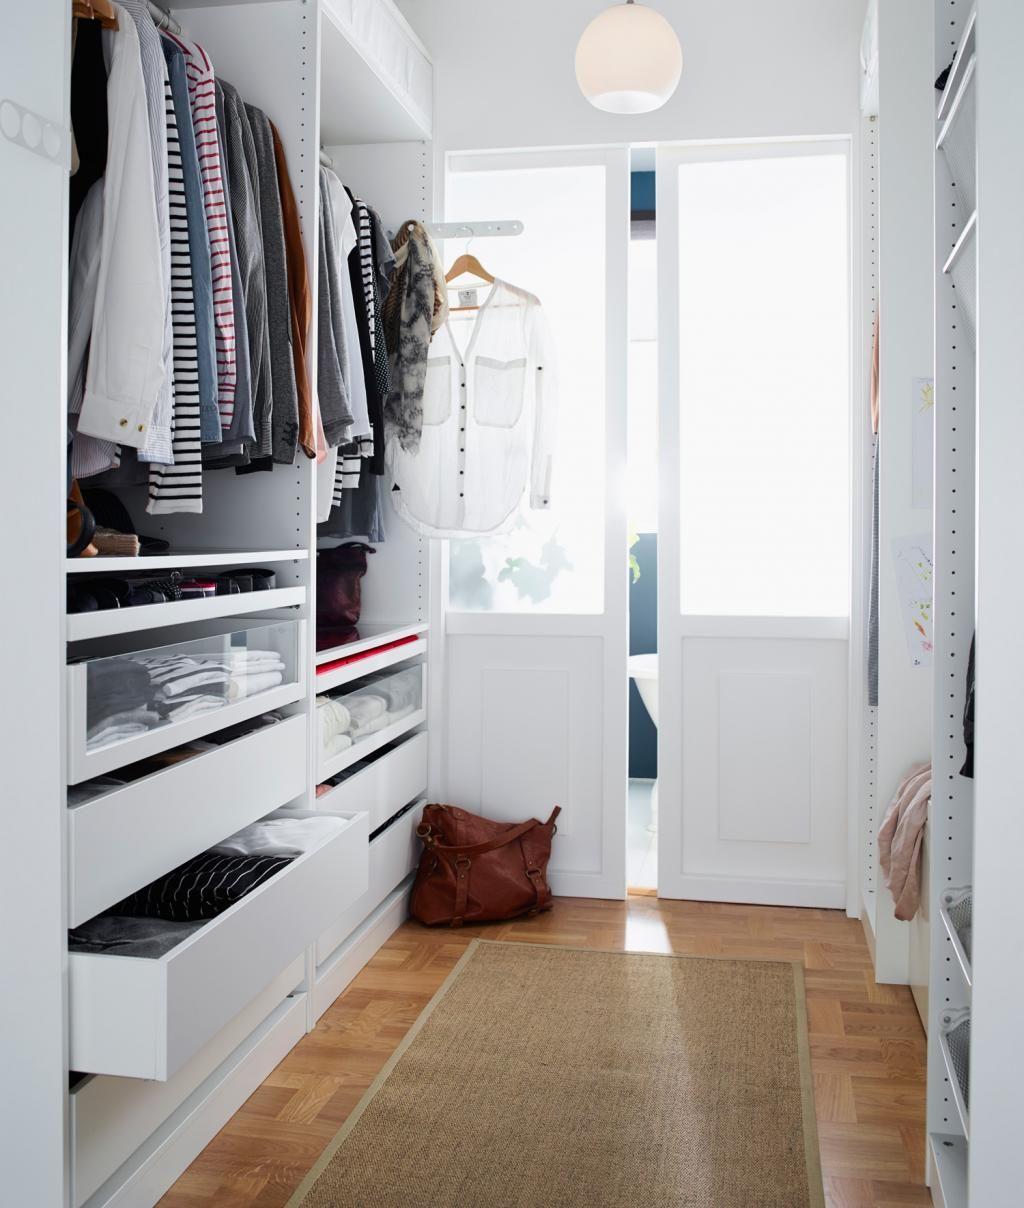 Pax Walk In Closet #1 | PAX - IKEA | W A R D R O B E | Pinterest